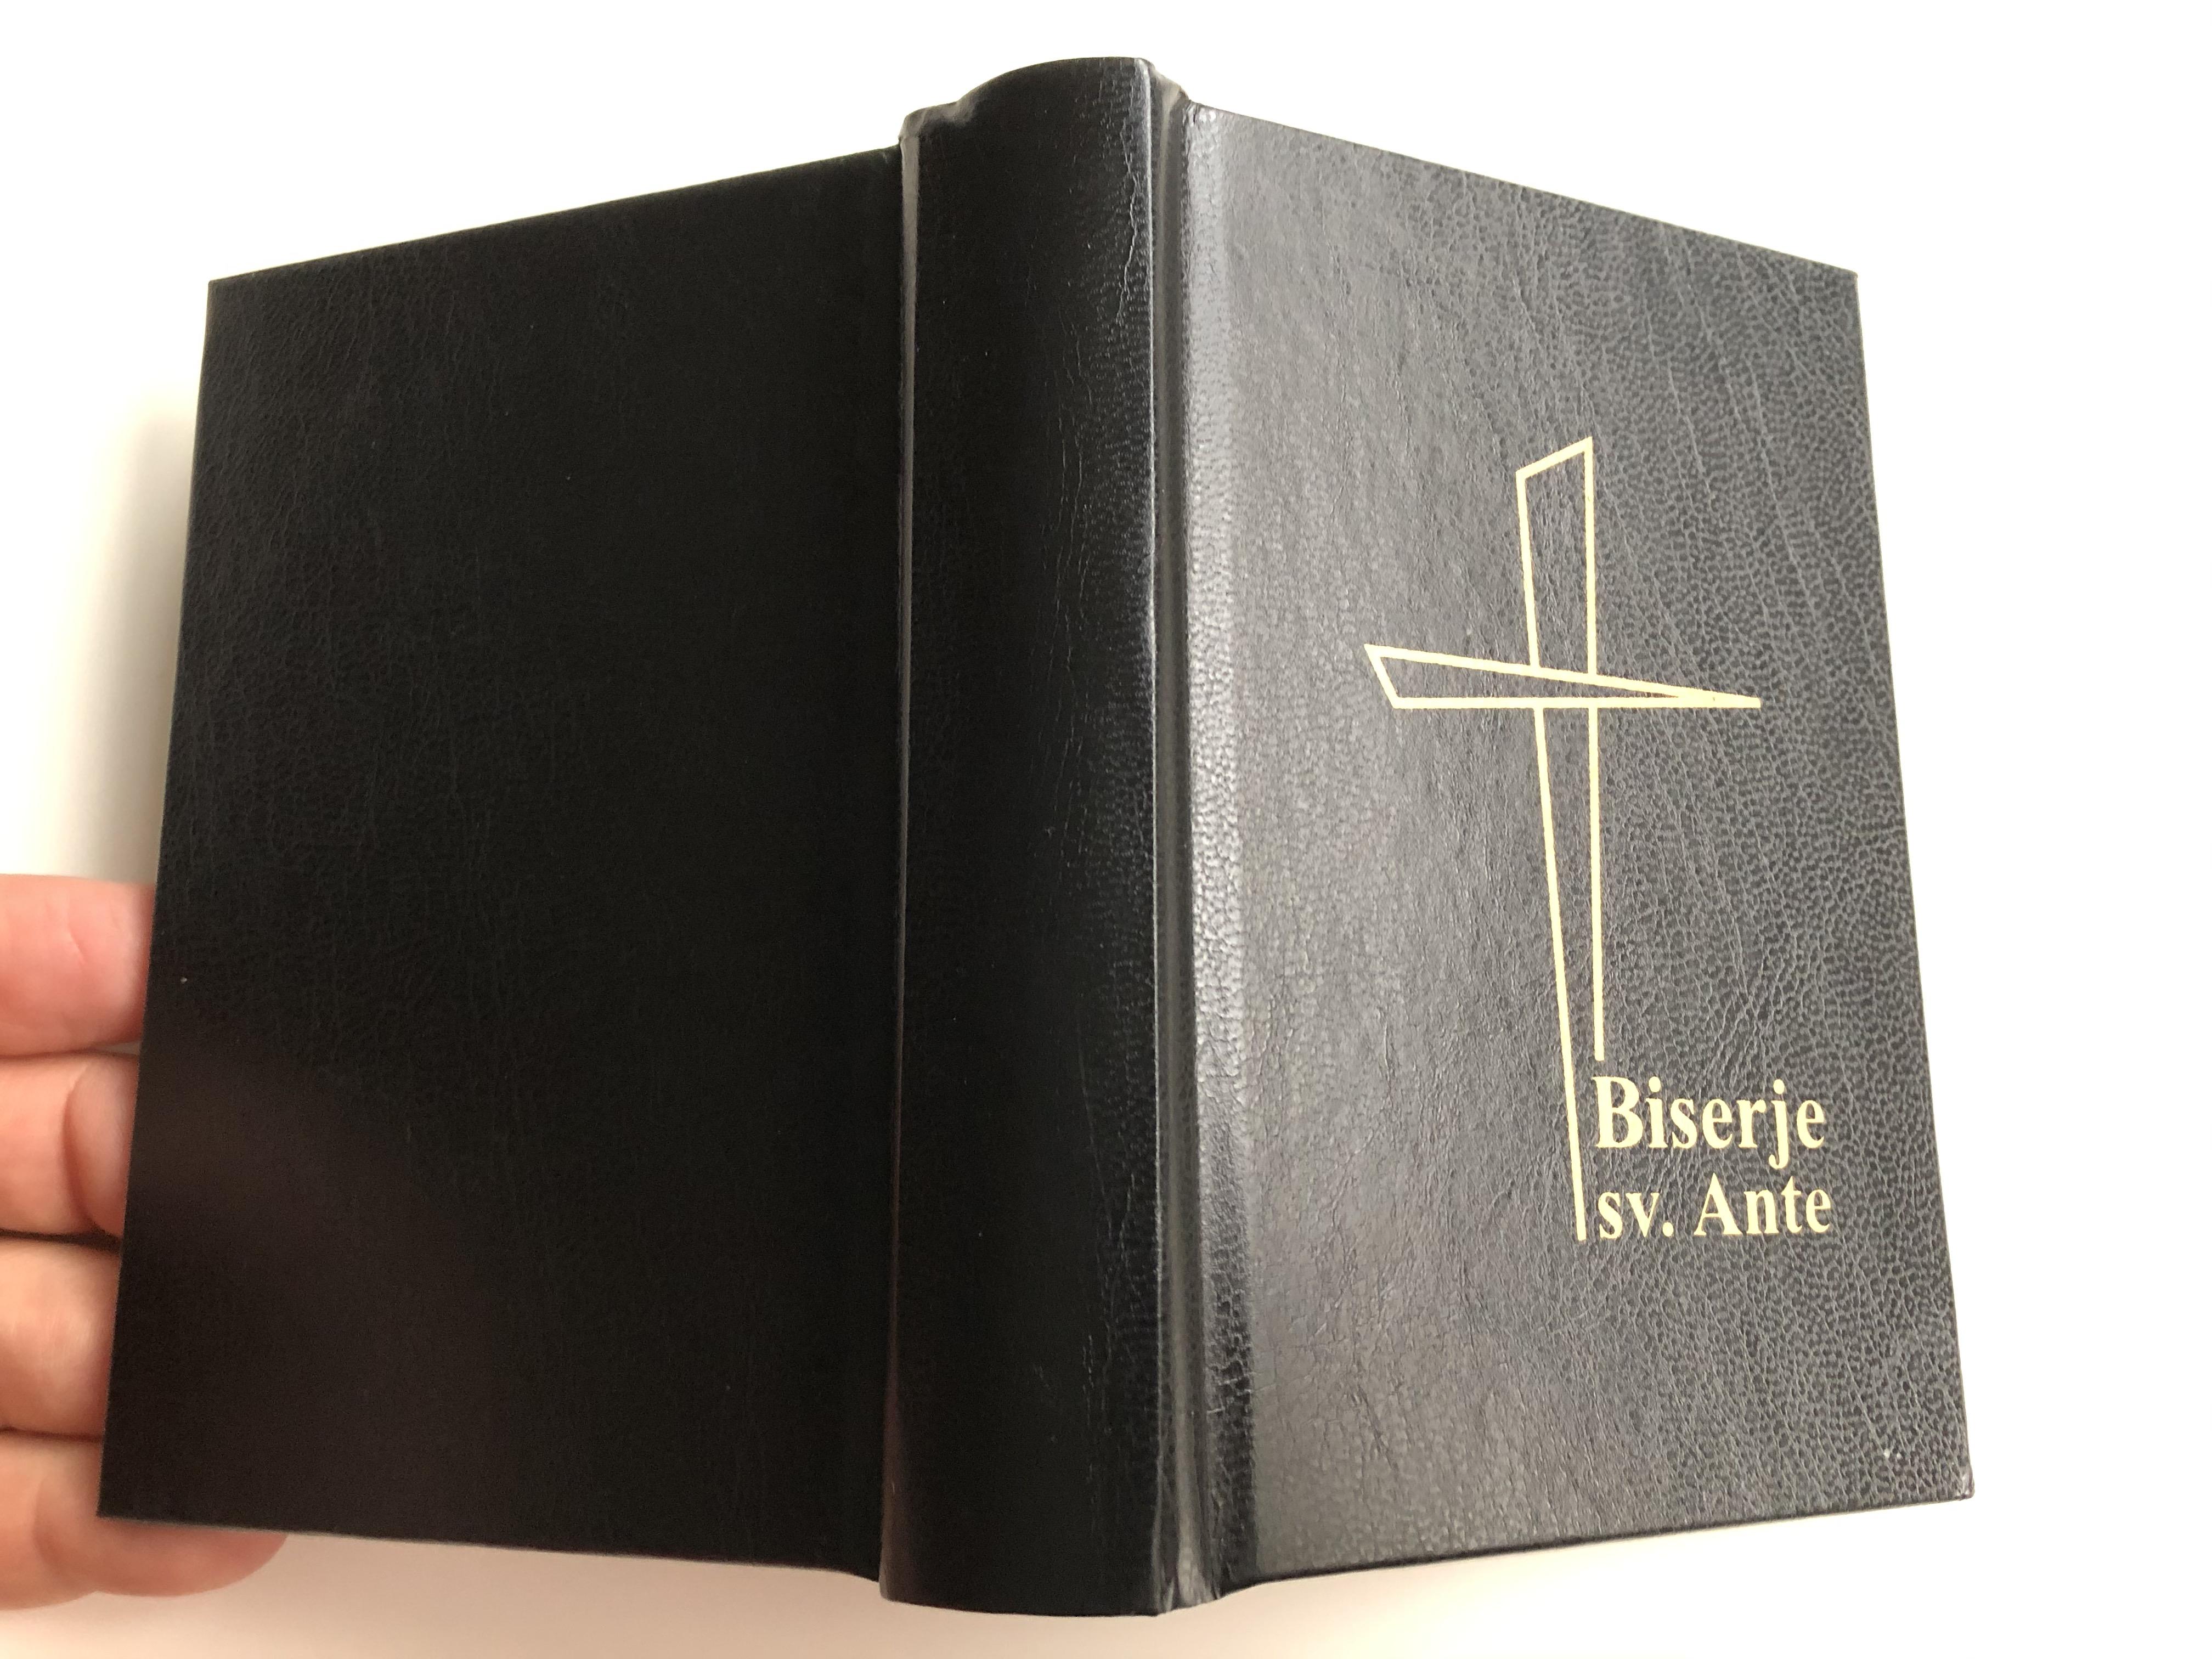 biserje-svetog-ante-pearls-of-st.-anthony-of-padua-croatian-language-catholic-prayerbook-17.jpg